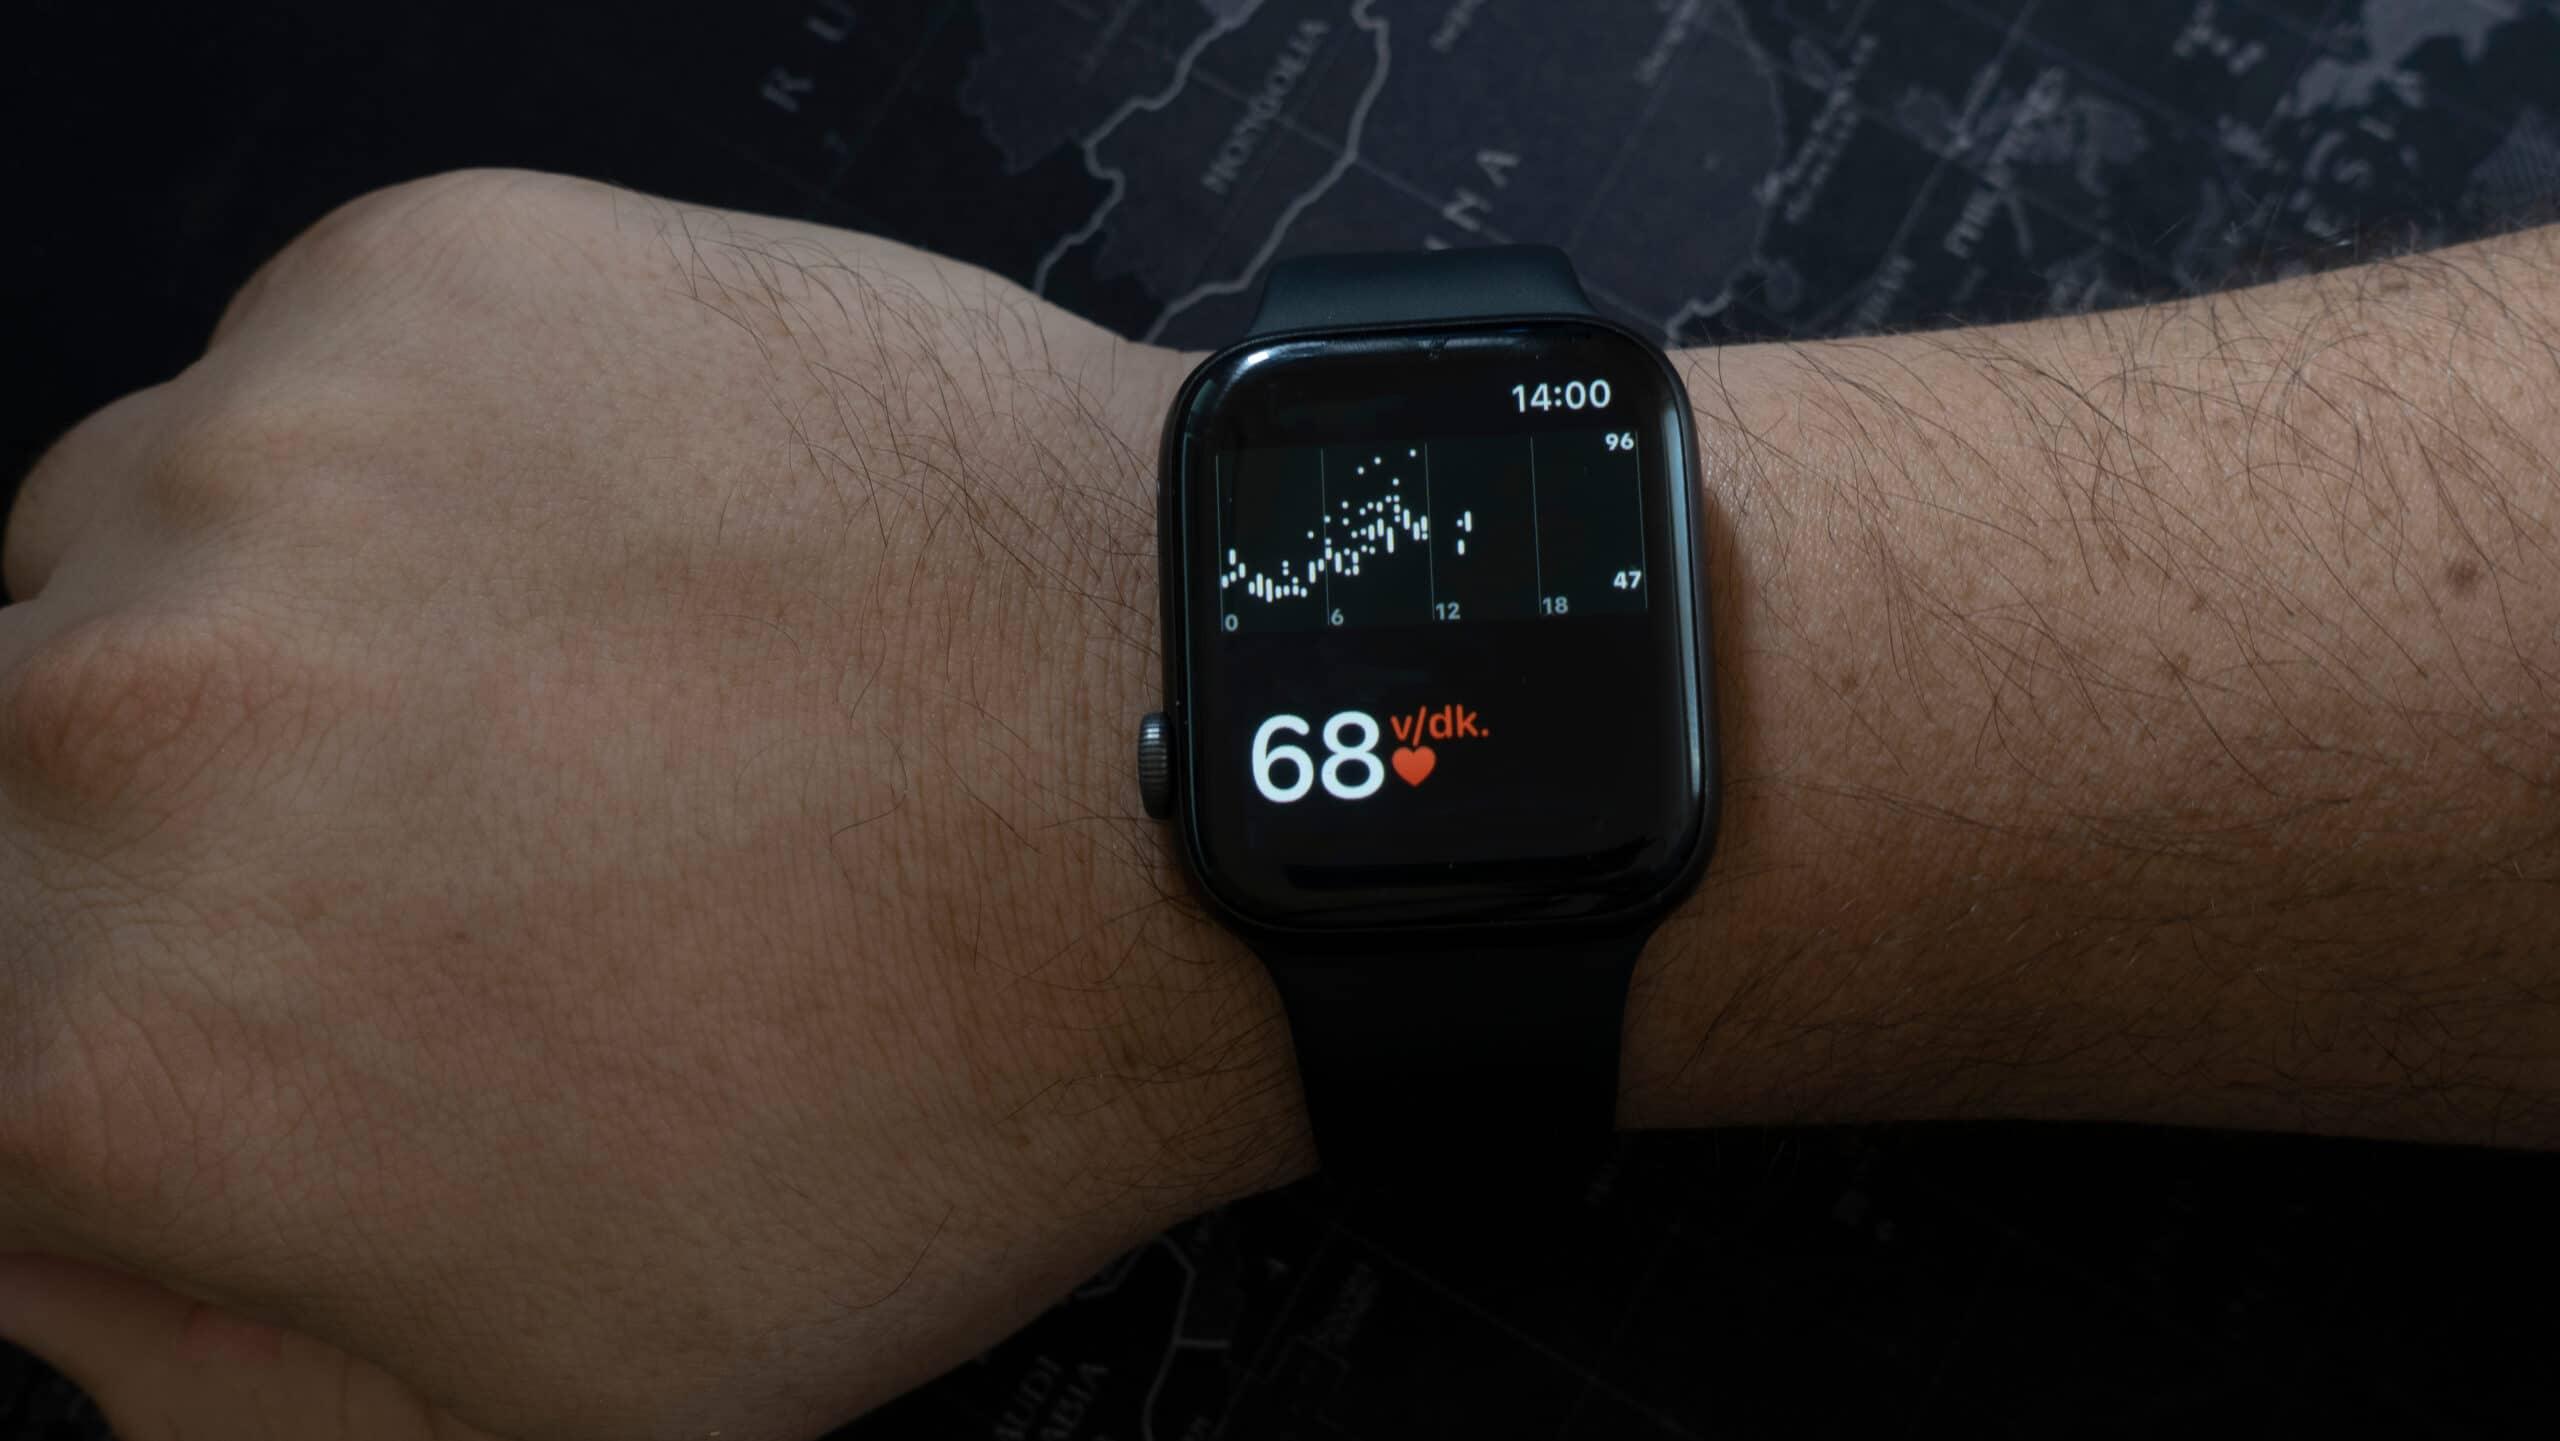 Apple Watch monitorando os batimentos cardíacos